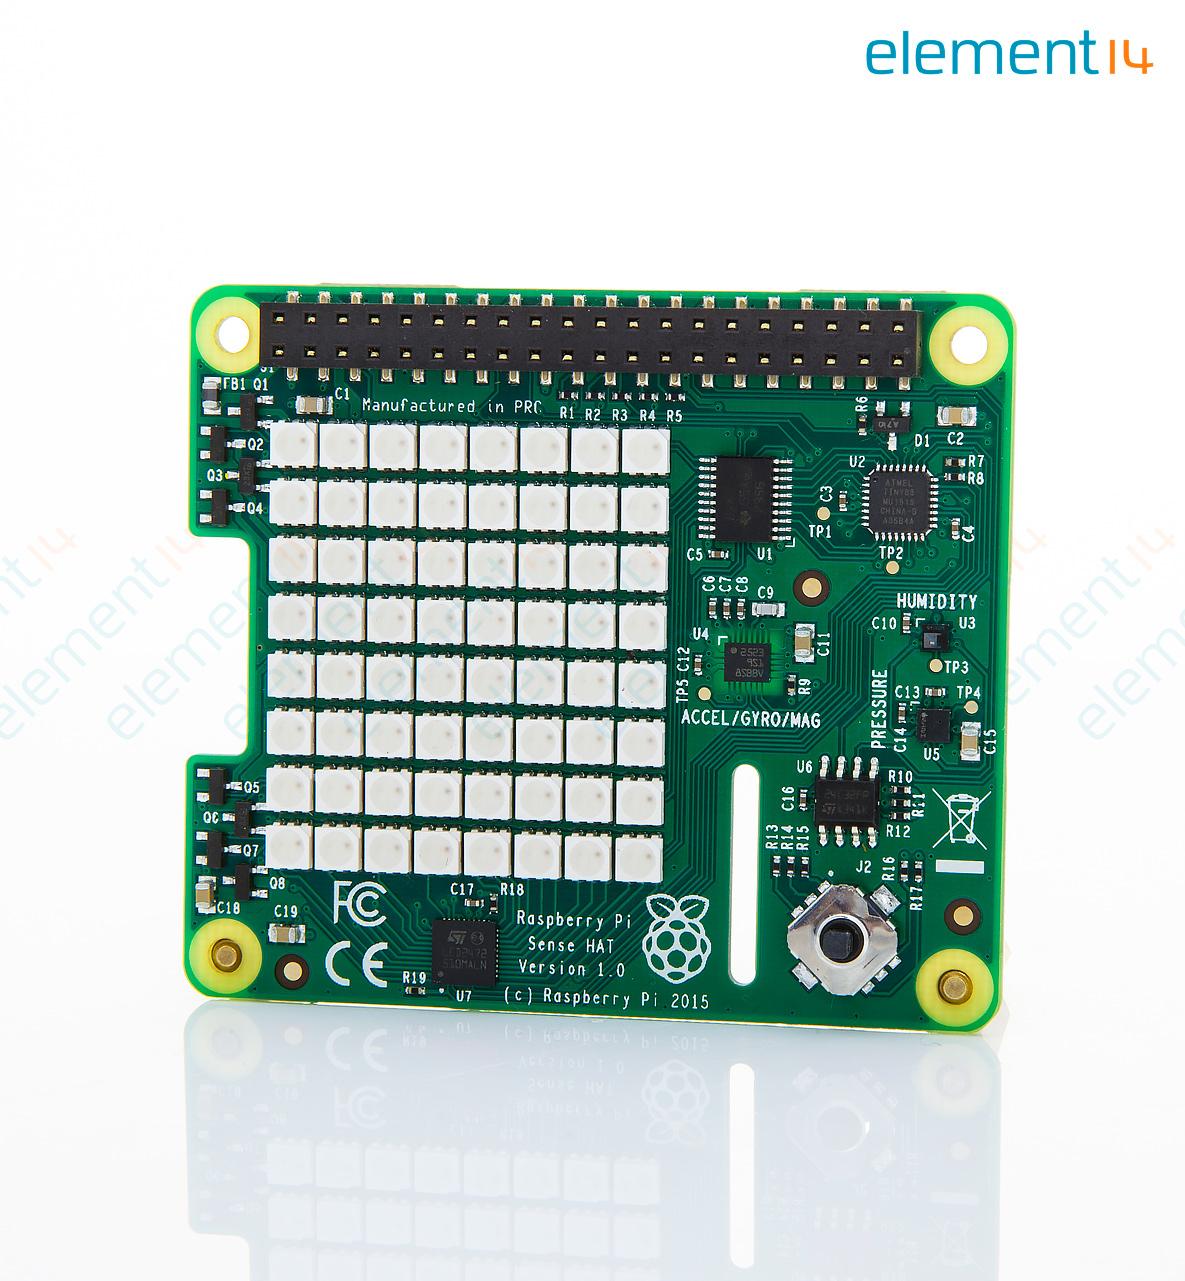 Raspberrypi Sensehat Raspberry Pi Daughter Board Circuit Richmedia 2700b En